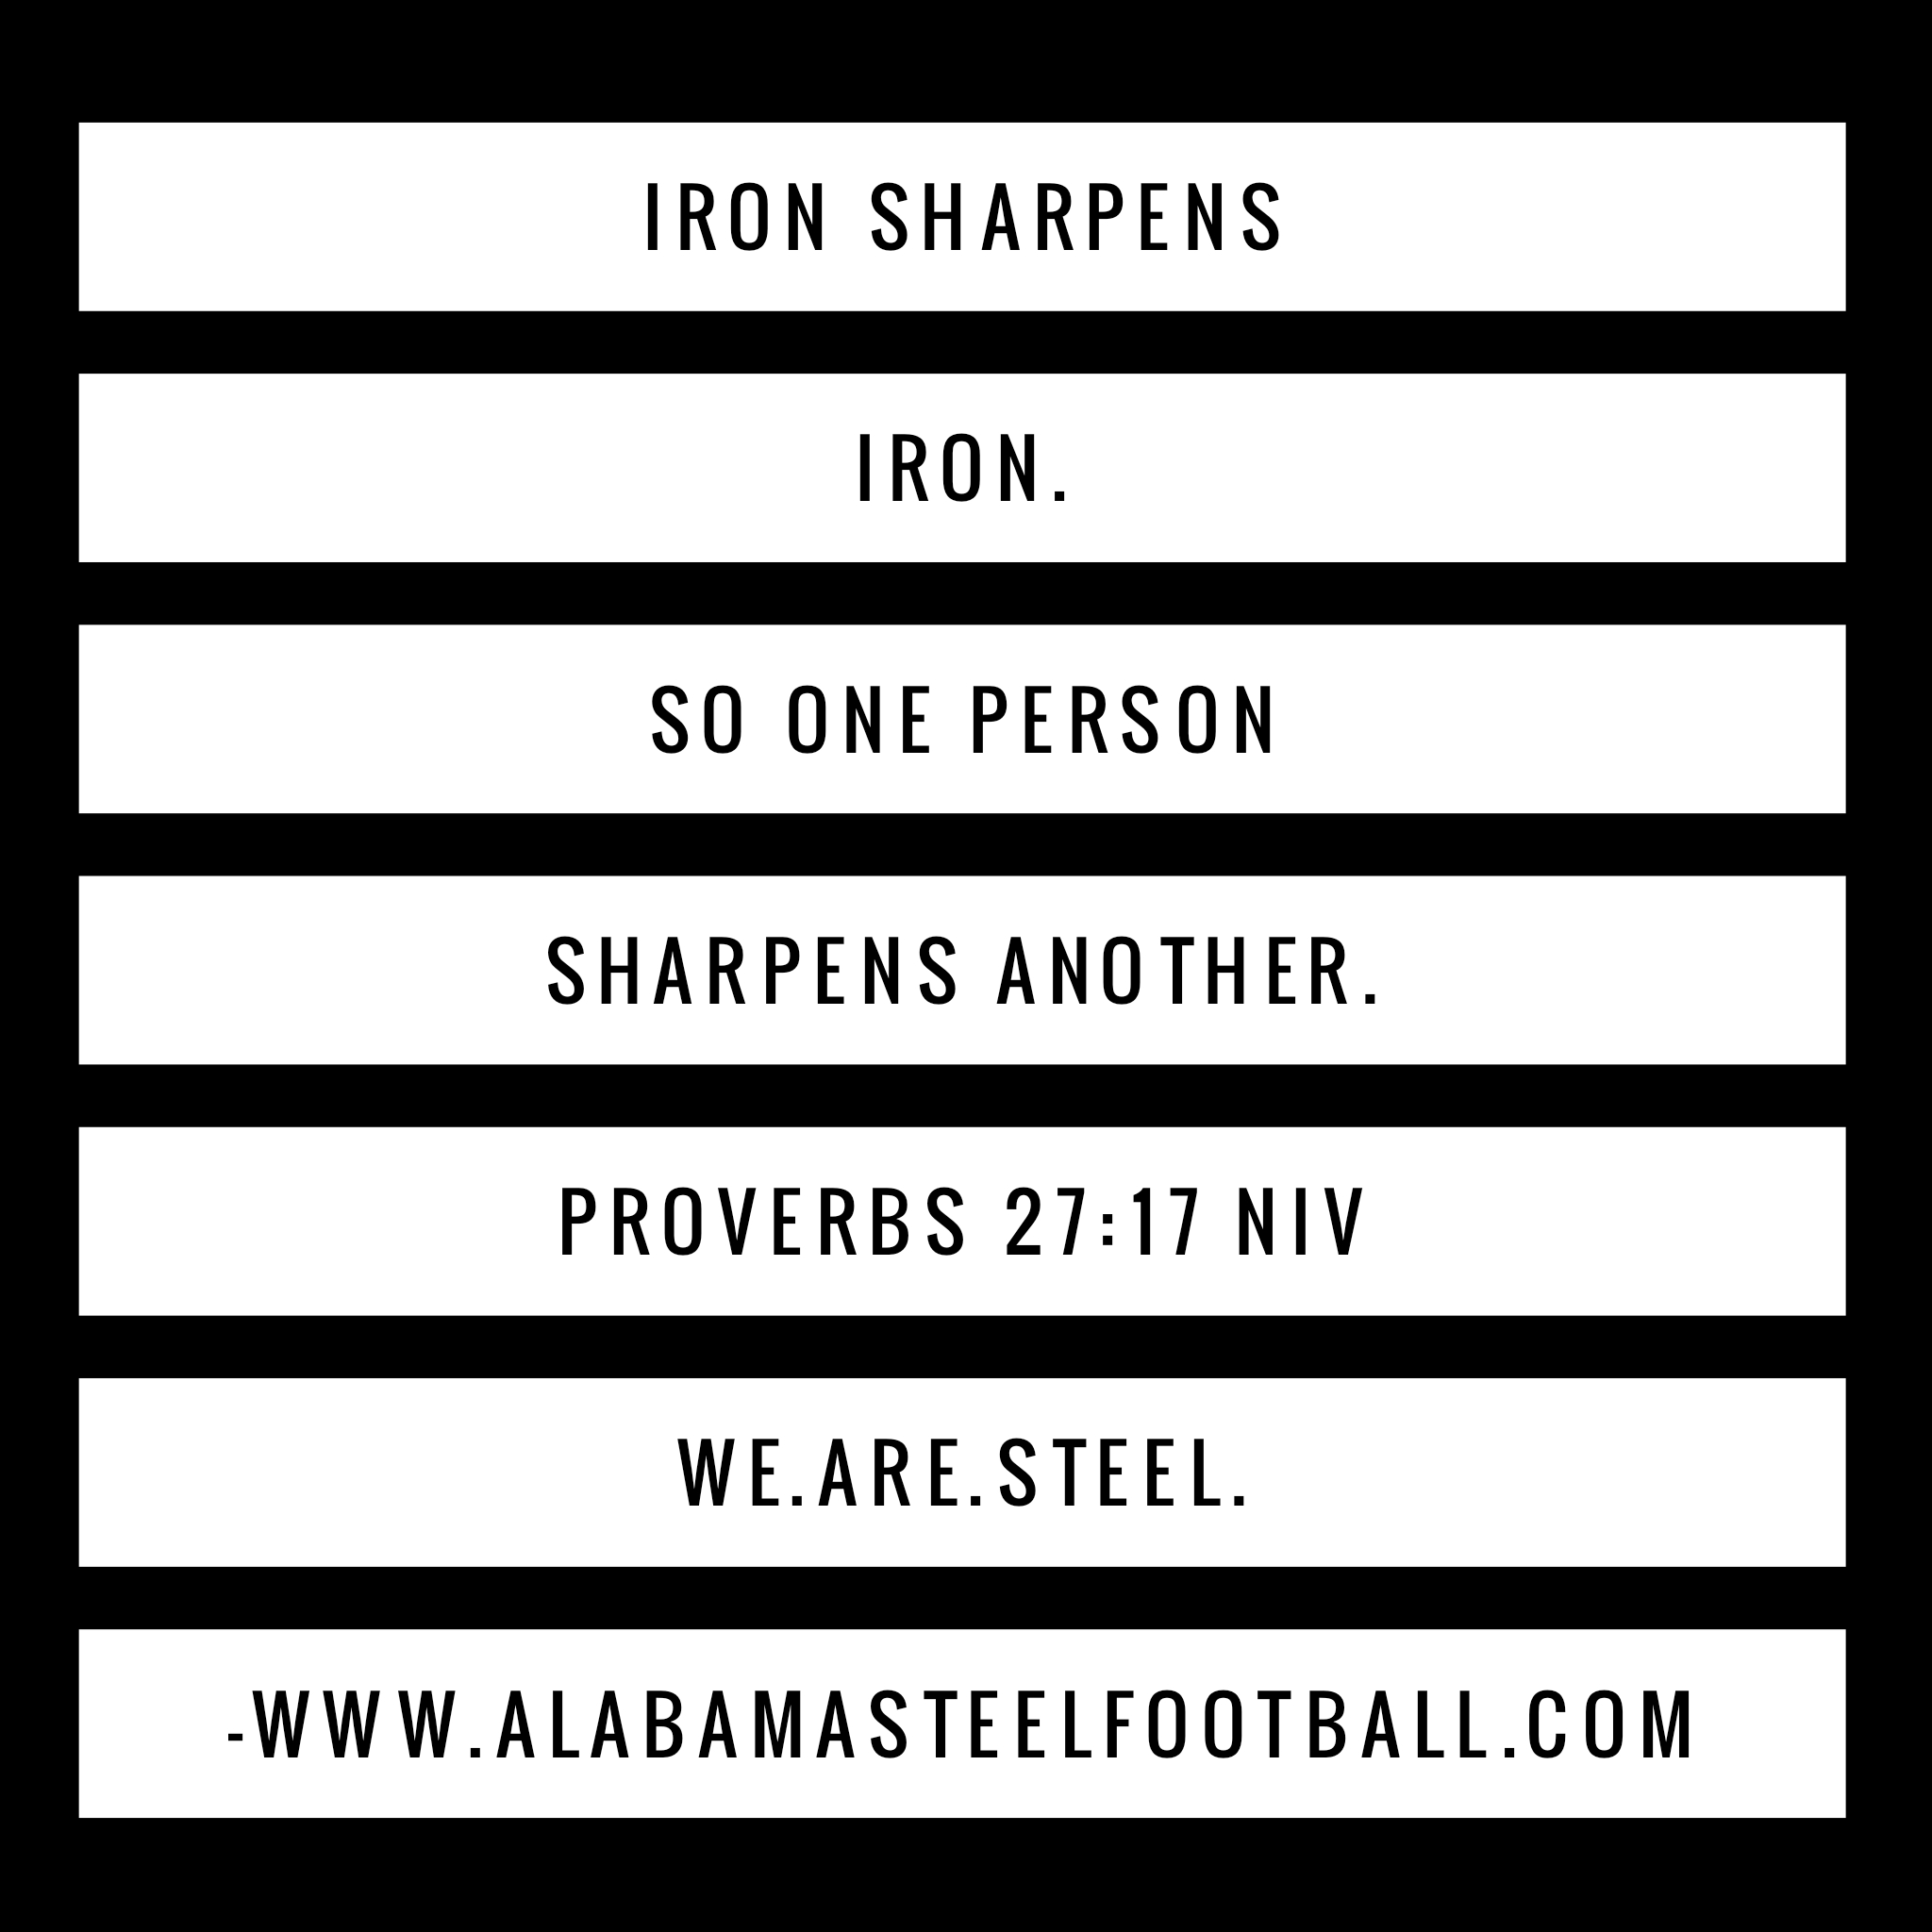 IRON SHARPENS IRON PROVERBS 27 17 NIV.jpg